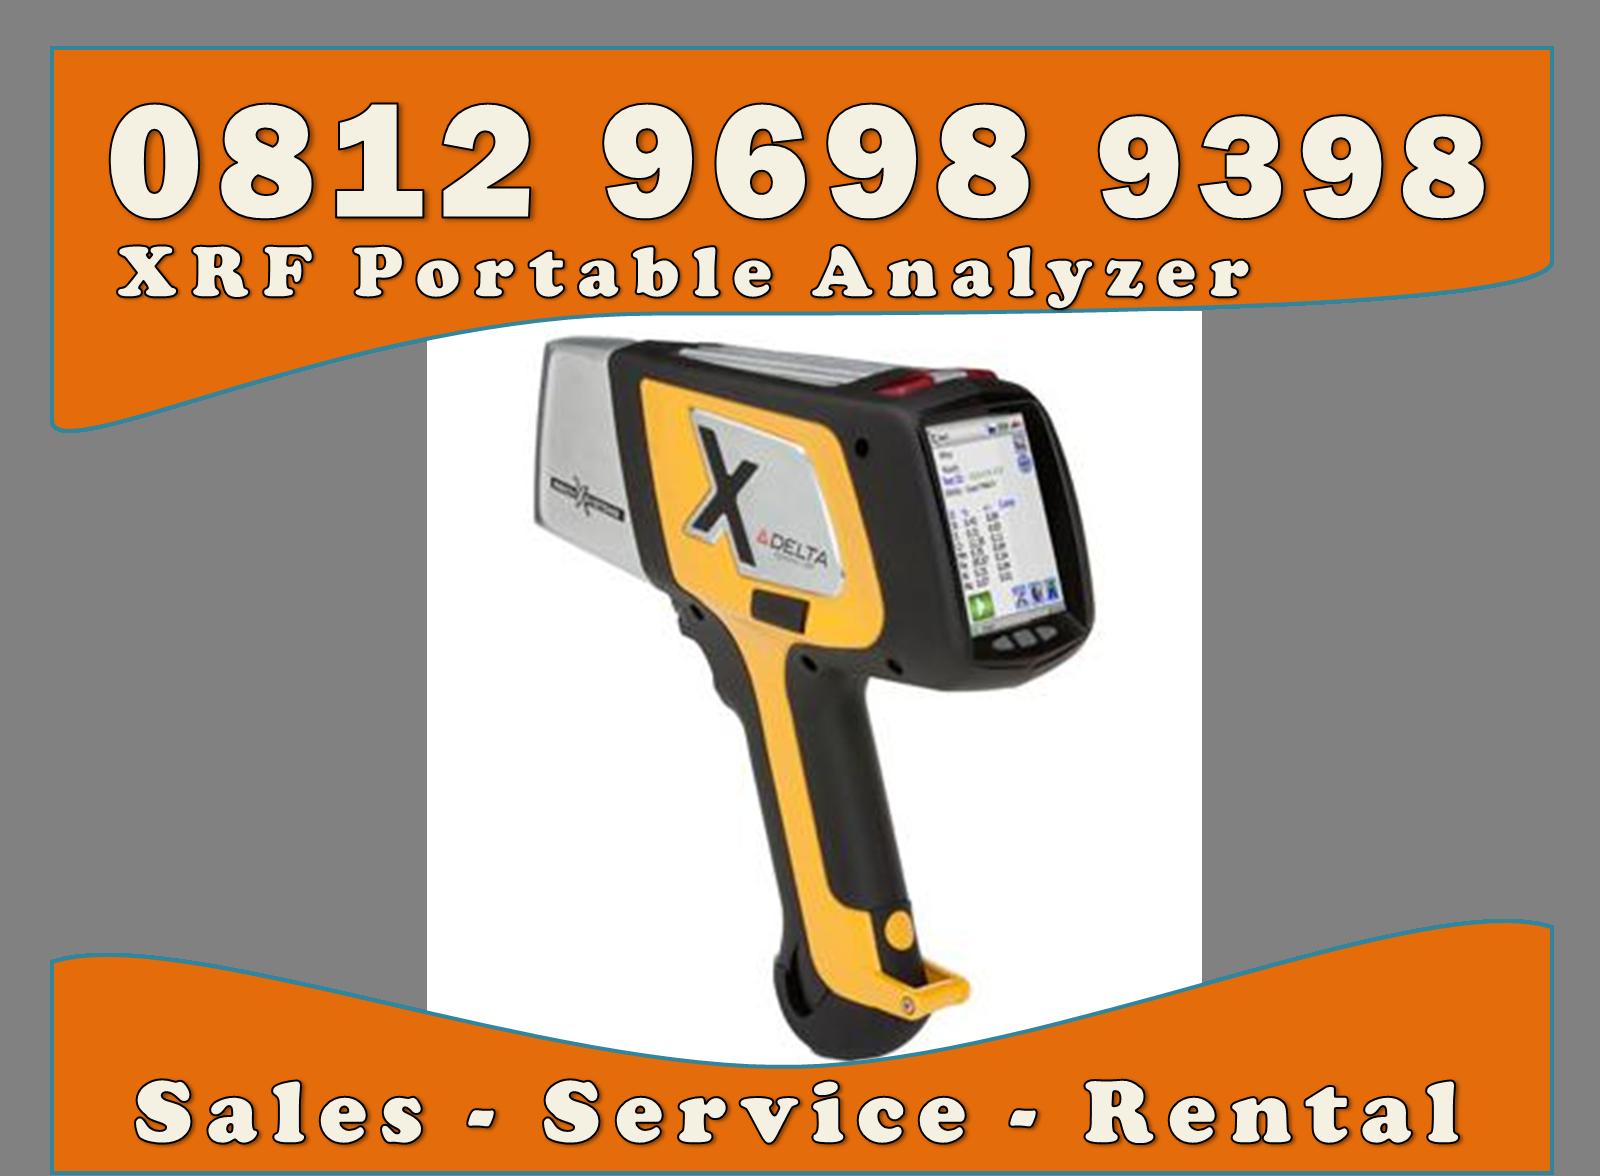 Terbaik Telp Wa 0812 9698 9398 Portable Xrf Analyzer Comparison Kota Langsa Aceh Di 2020 Kota Bukittinggi Kota Manado Cali